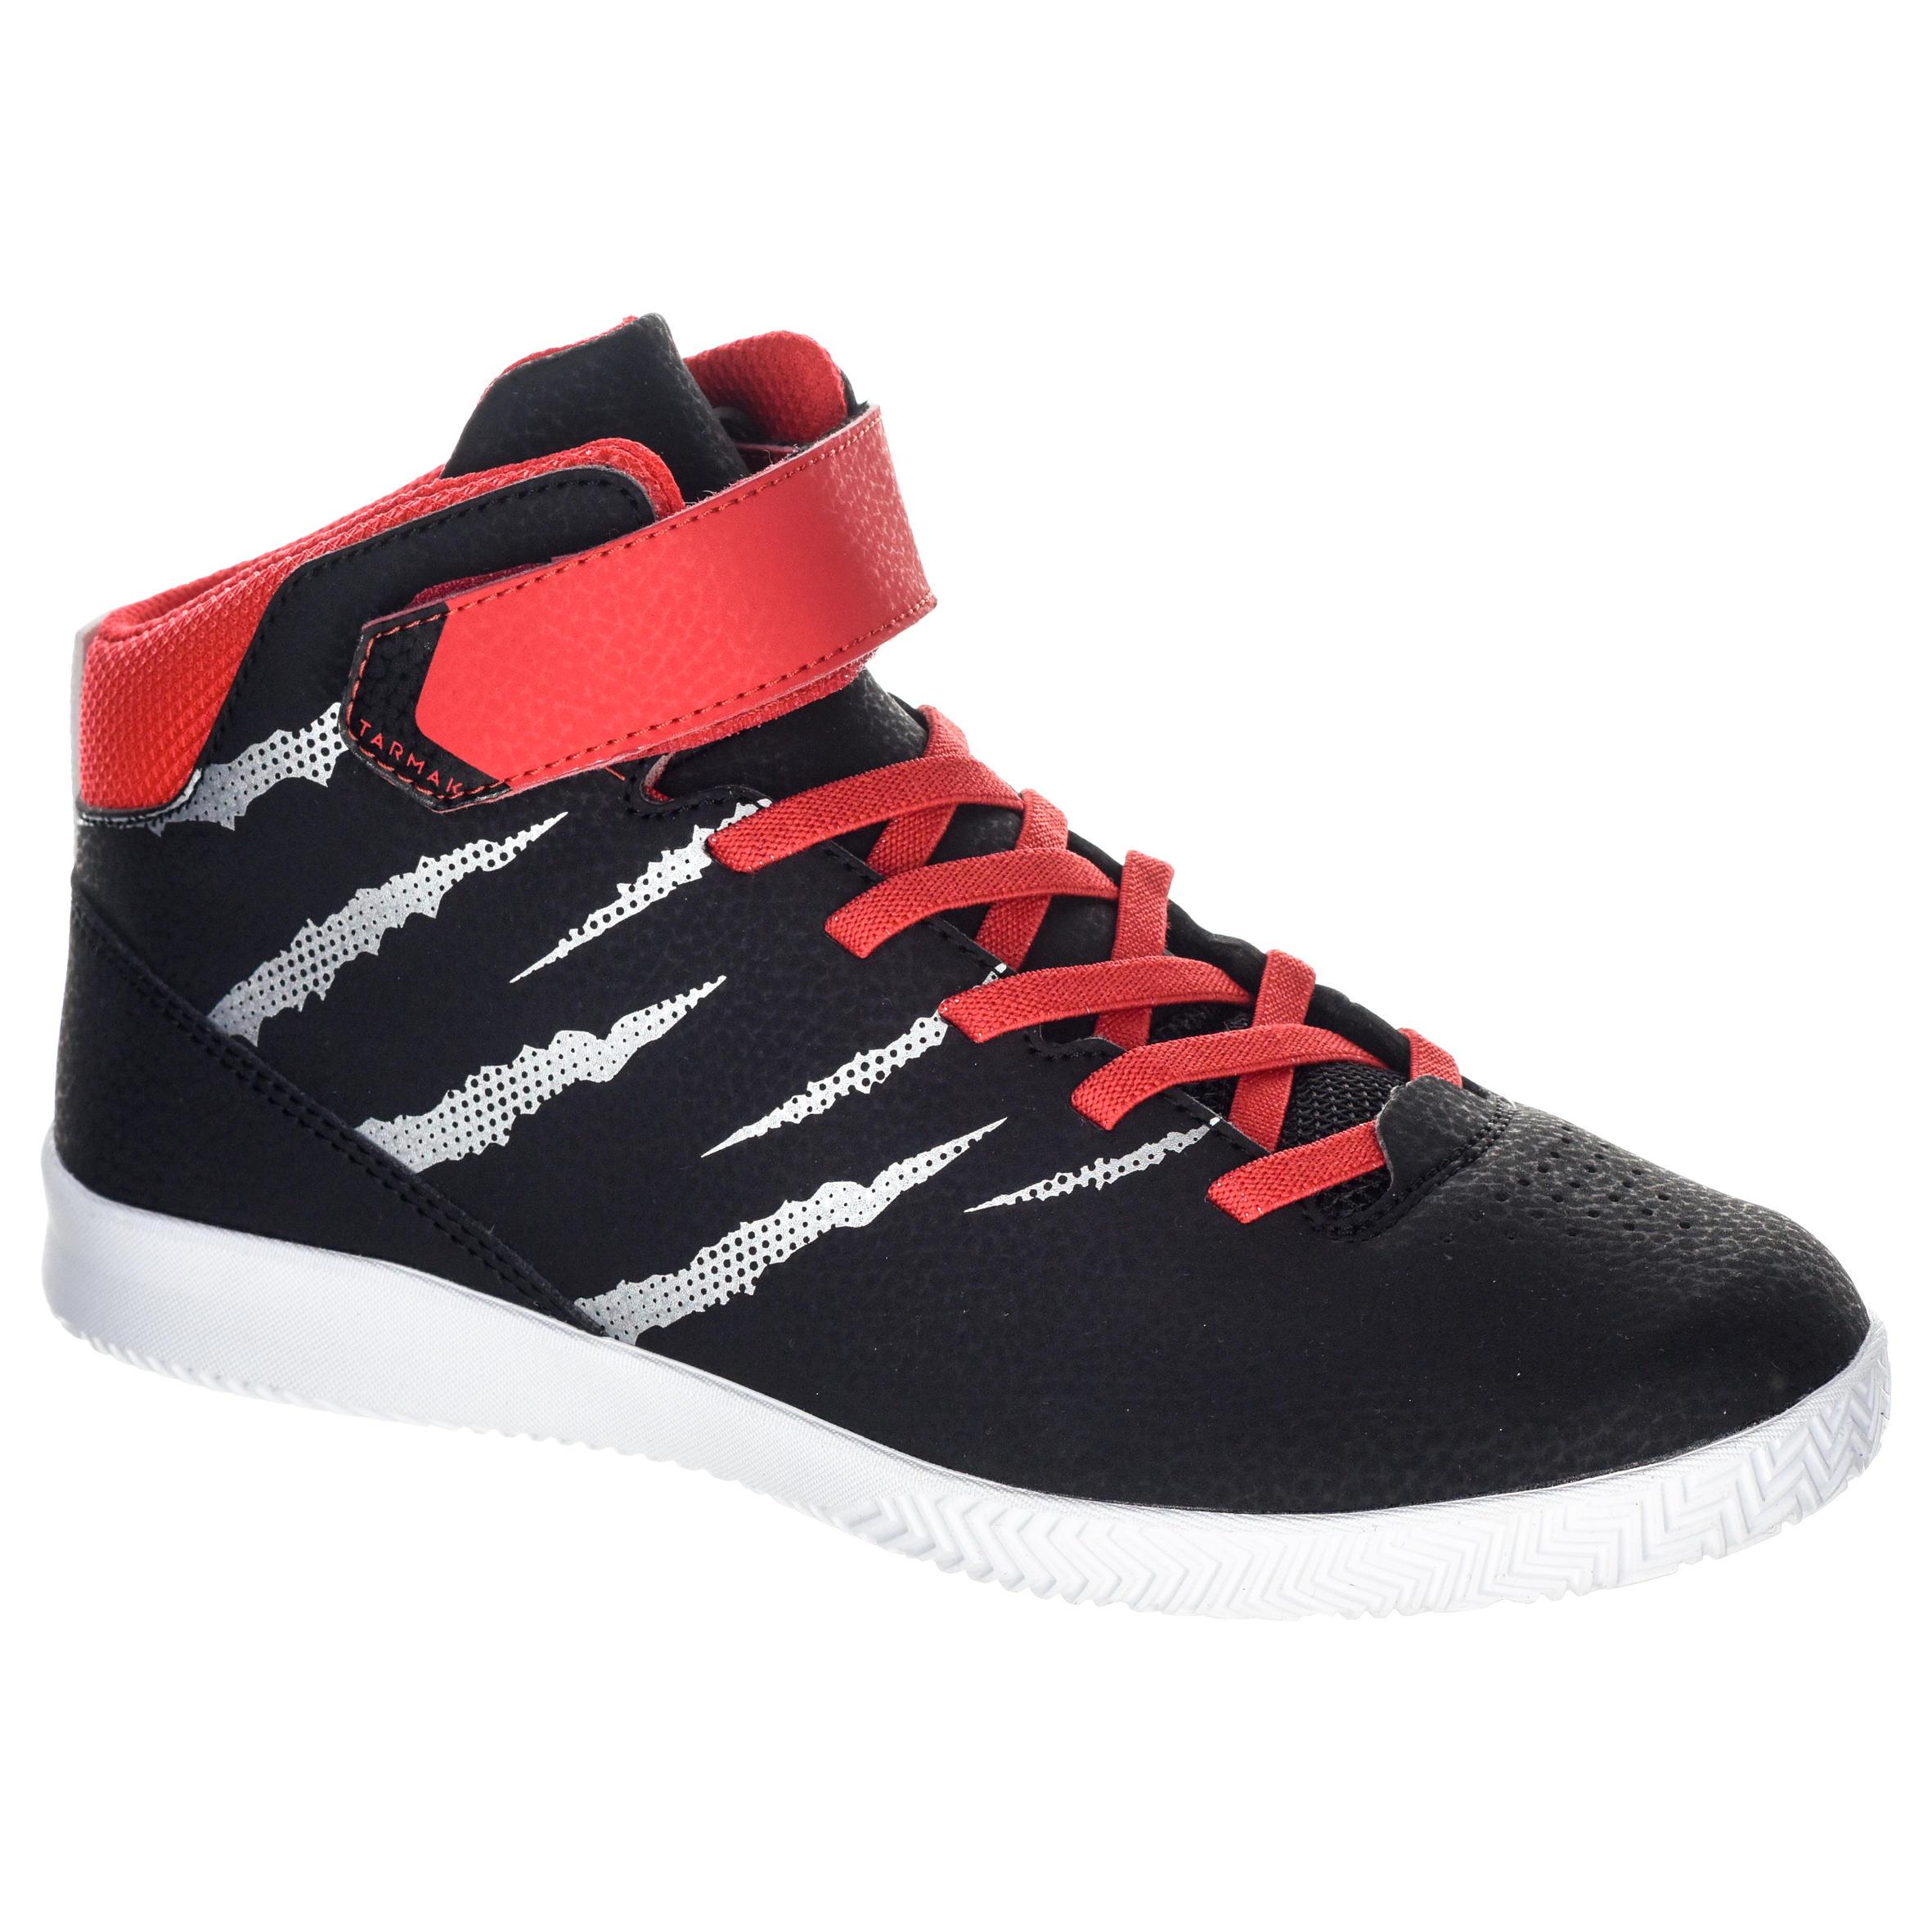 Tarmak Basketbalschoenen SE100 jongens/meisjes beginners zwart rood